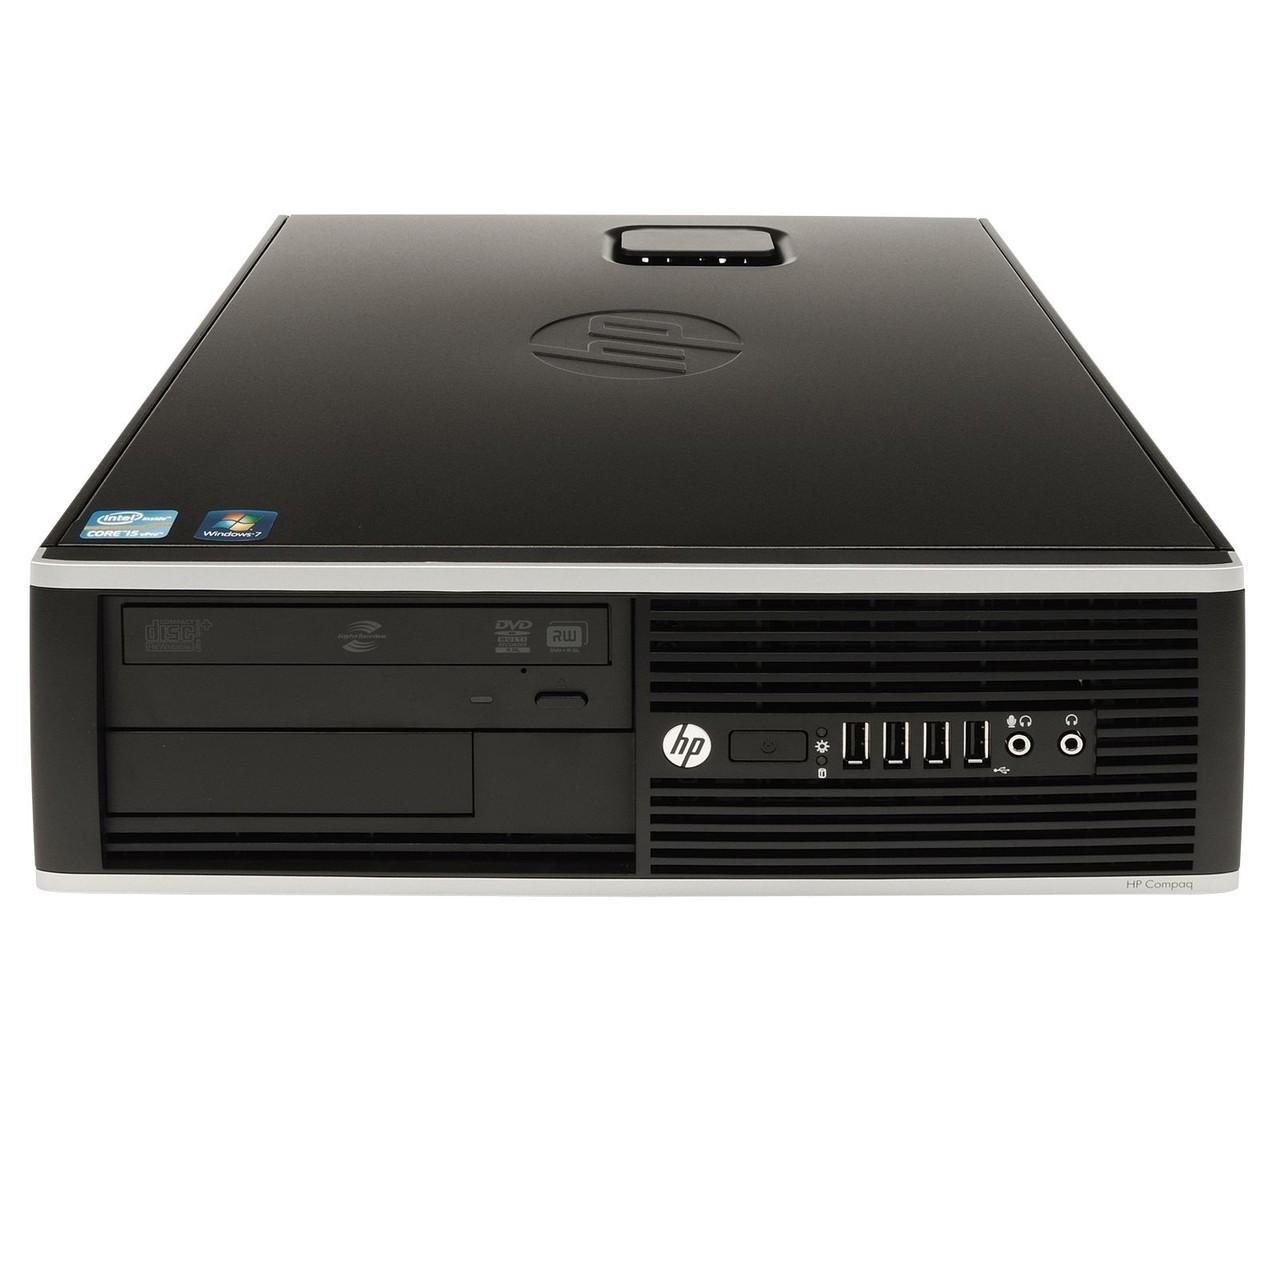 Desktop 8100 HP CPU (Core i5 1st 4GB 250GB DVD) Used